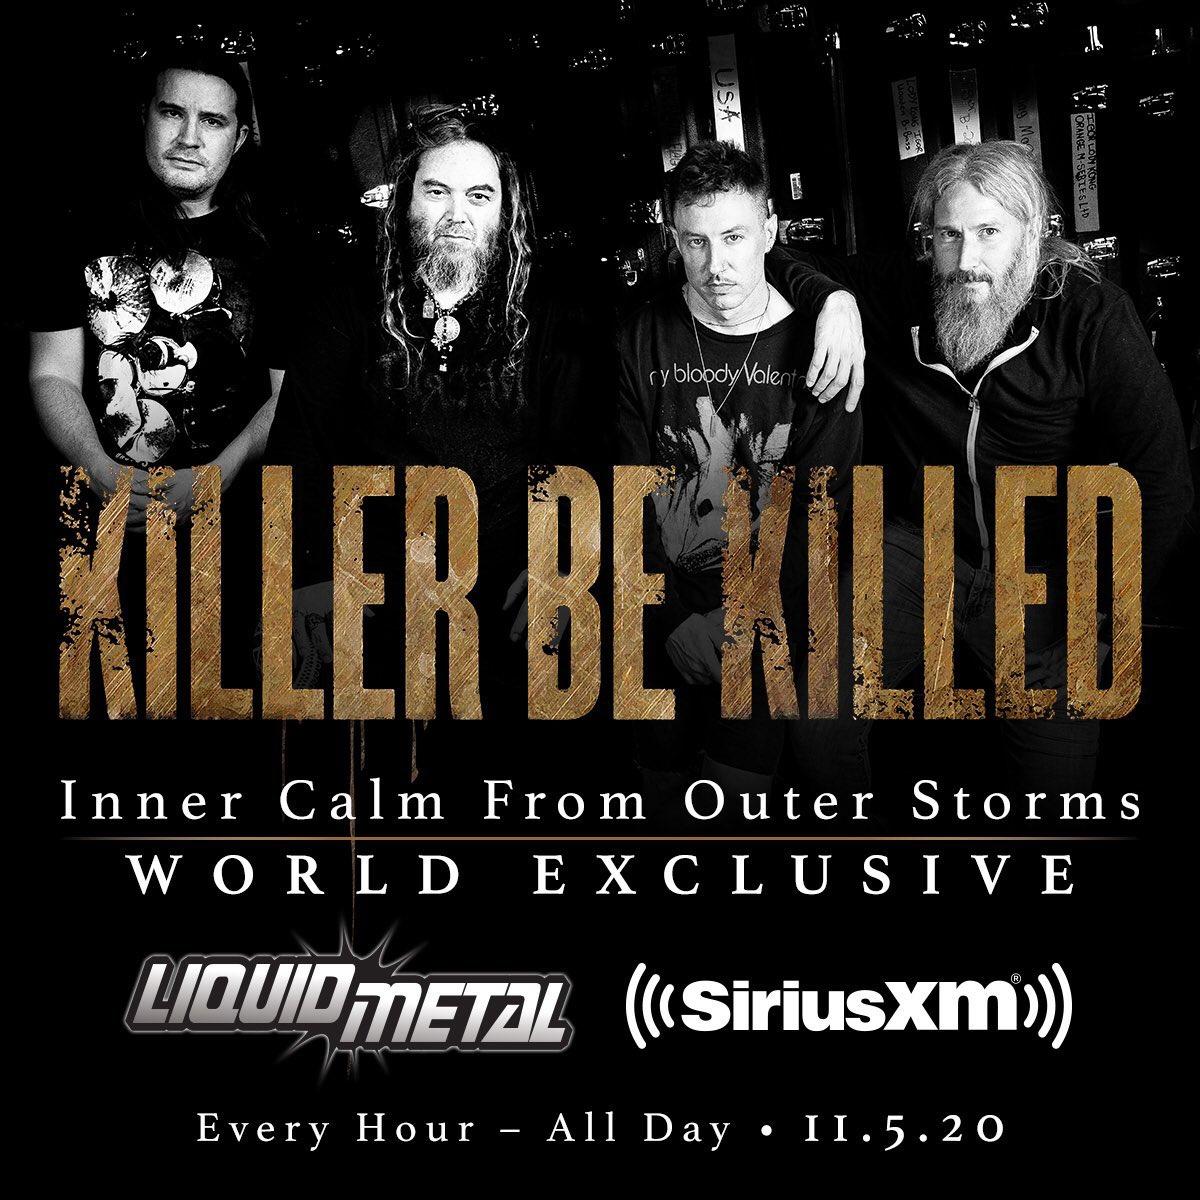 World Exclusive! Brand new @KillerBeKilled all day today @SXMLiquidMetal #KillerBeKilled 🤘🏼🤘🏼